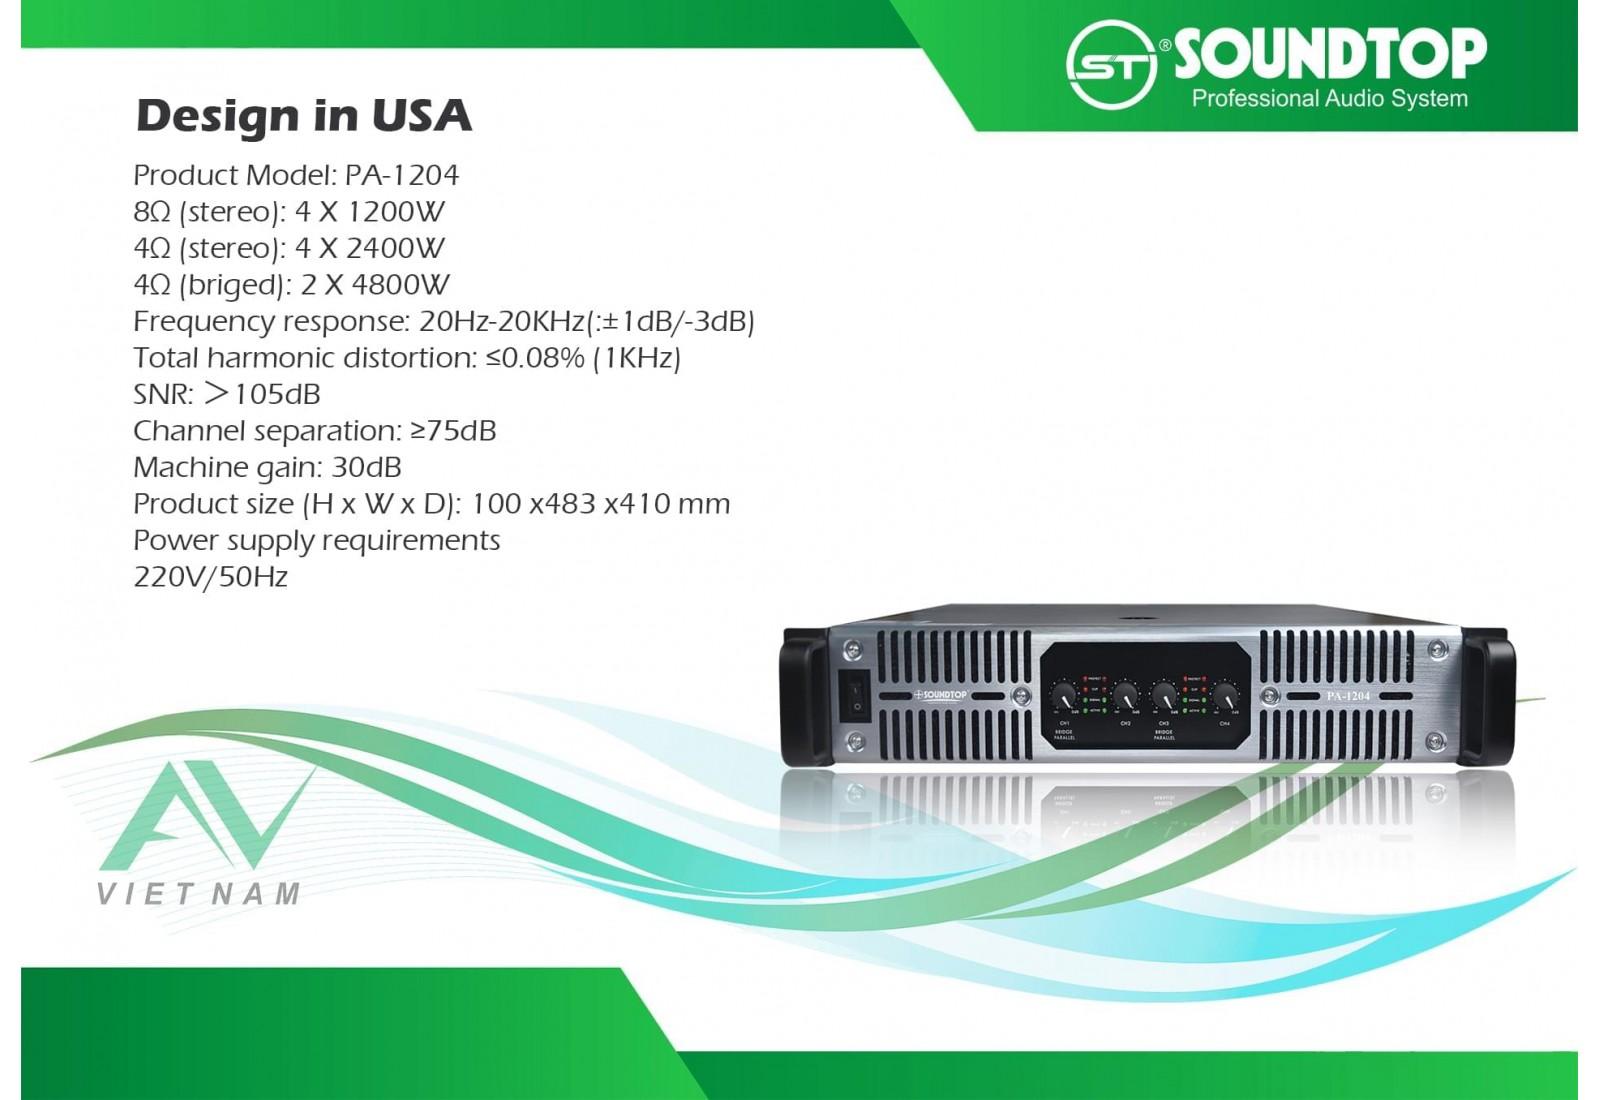 SOUNDTOP PA-1204